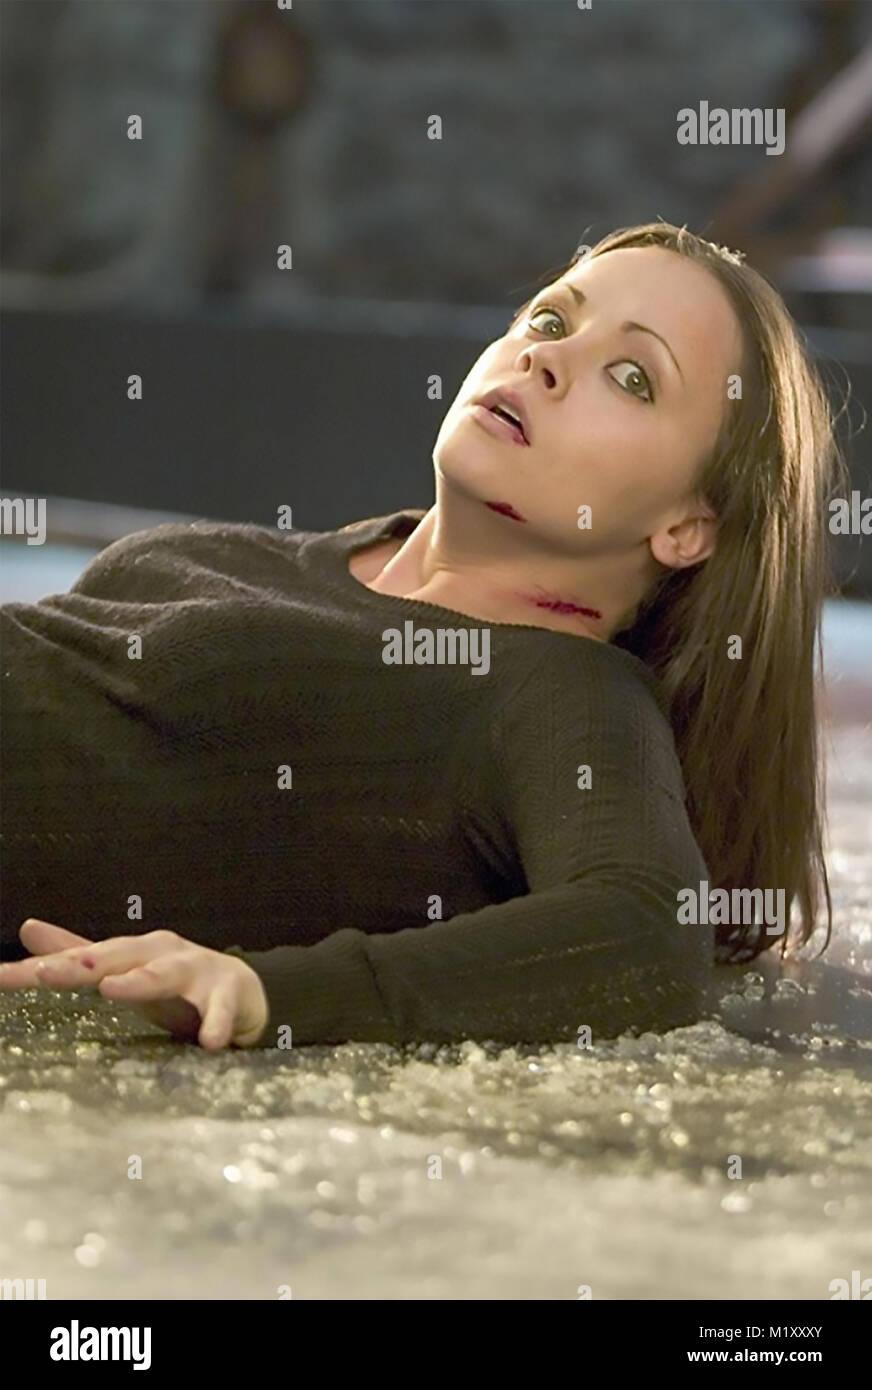 Maudit 2005 Dimension Films Production avec Christina Ricci Photo Stock